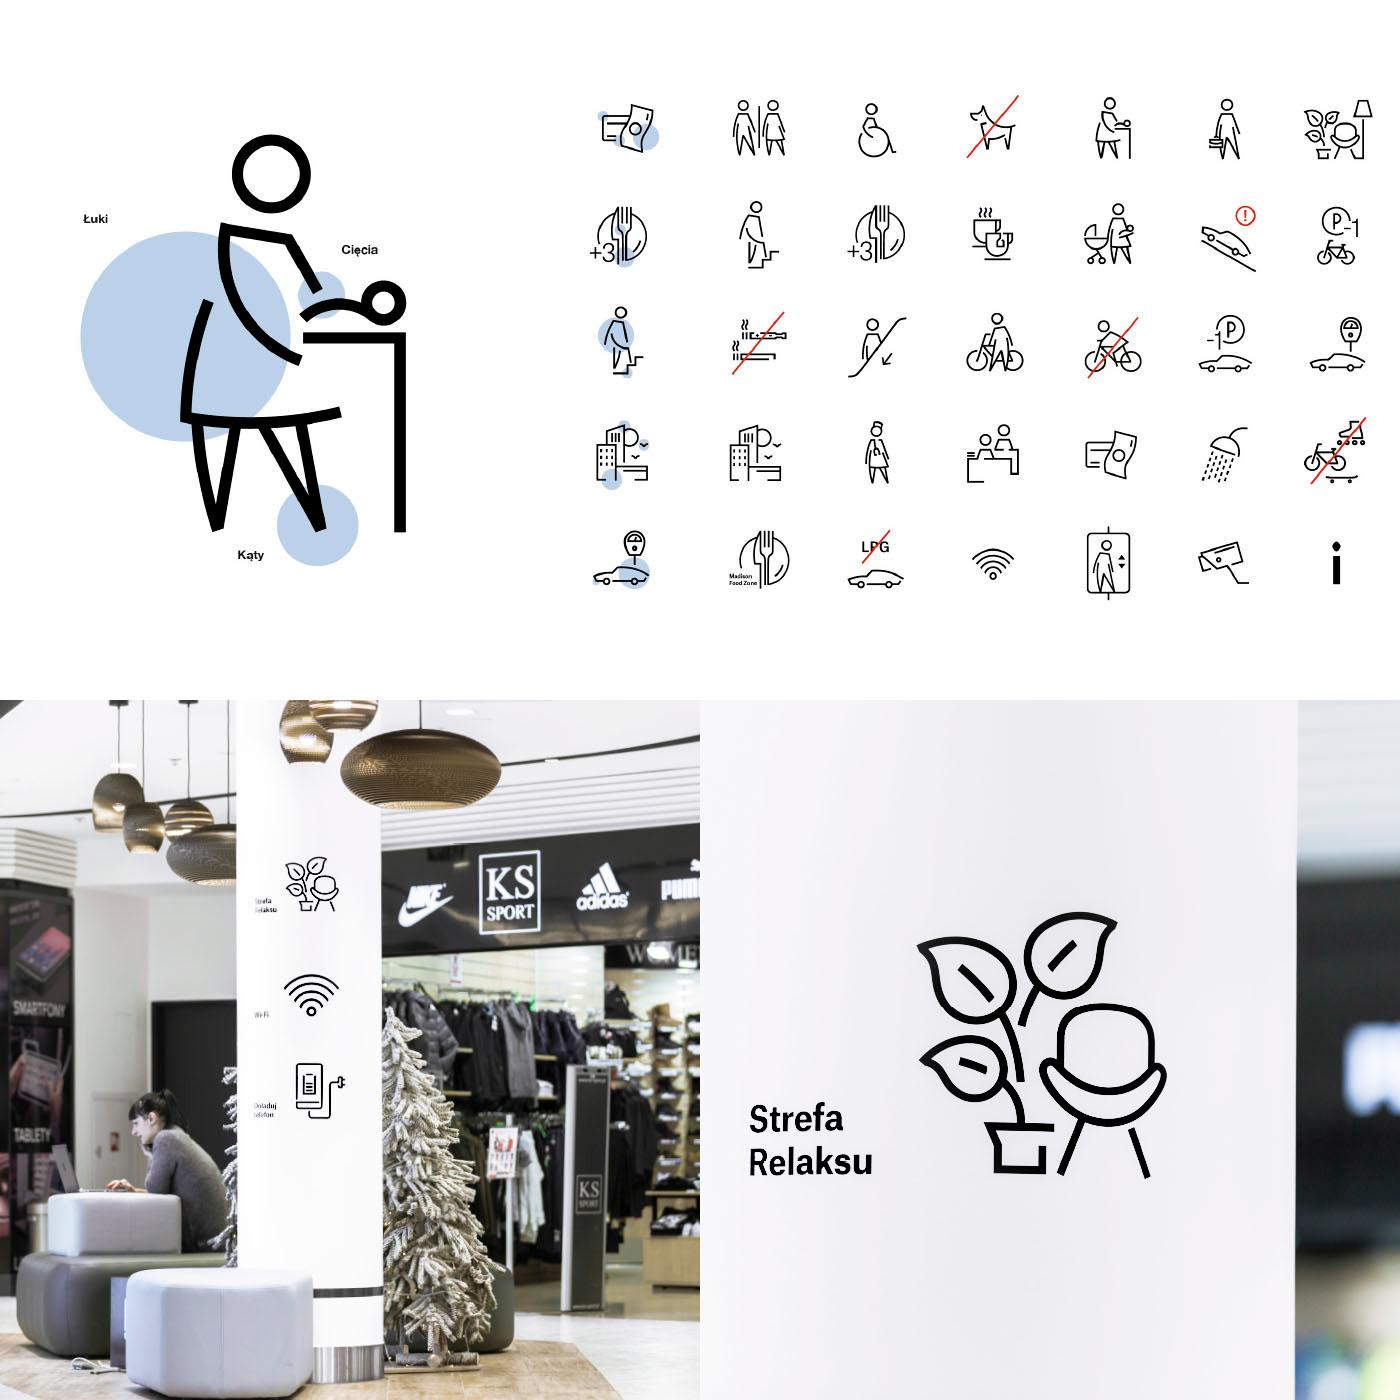 Madison UVMW wayfinding pictogram Gdansk Danzig warsaw identity siw